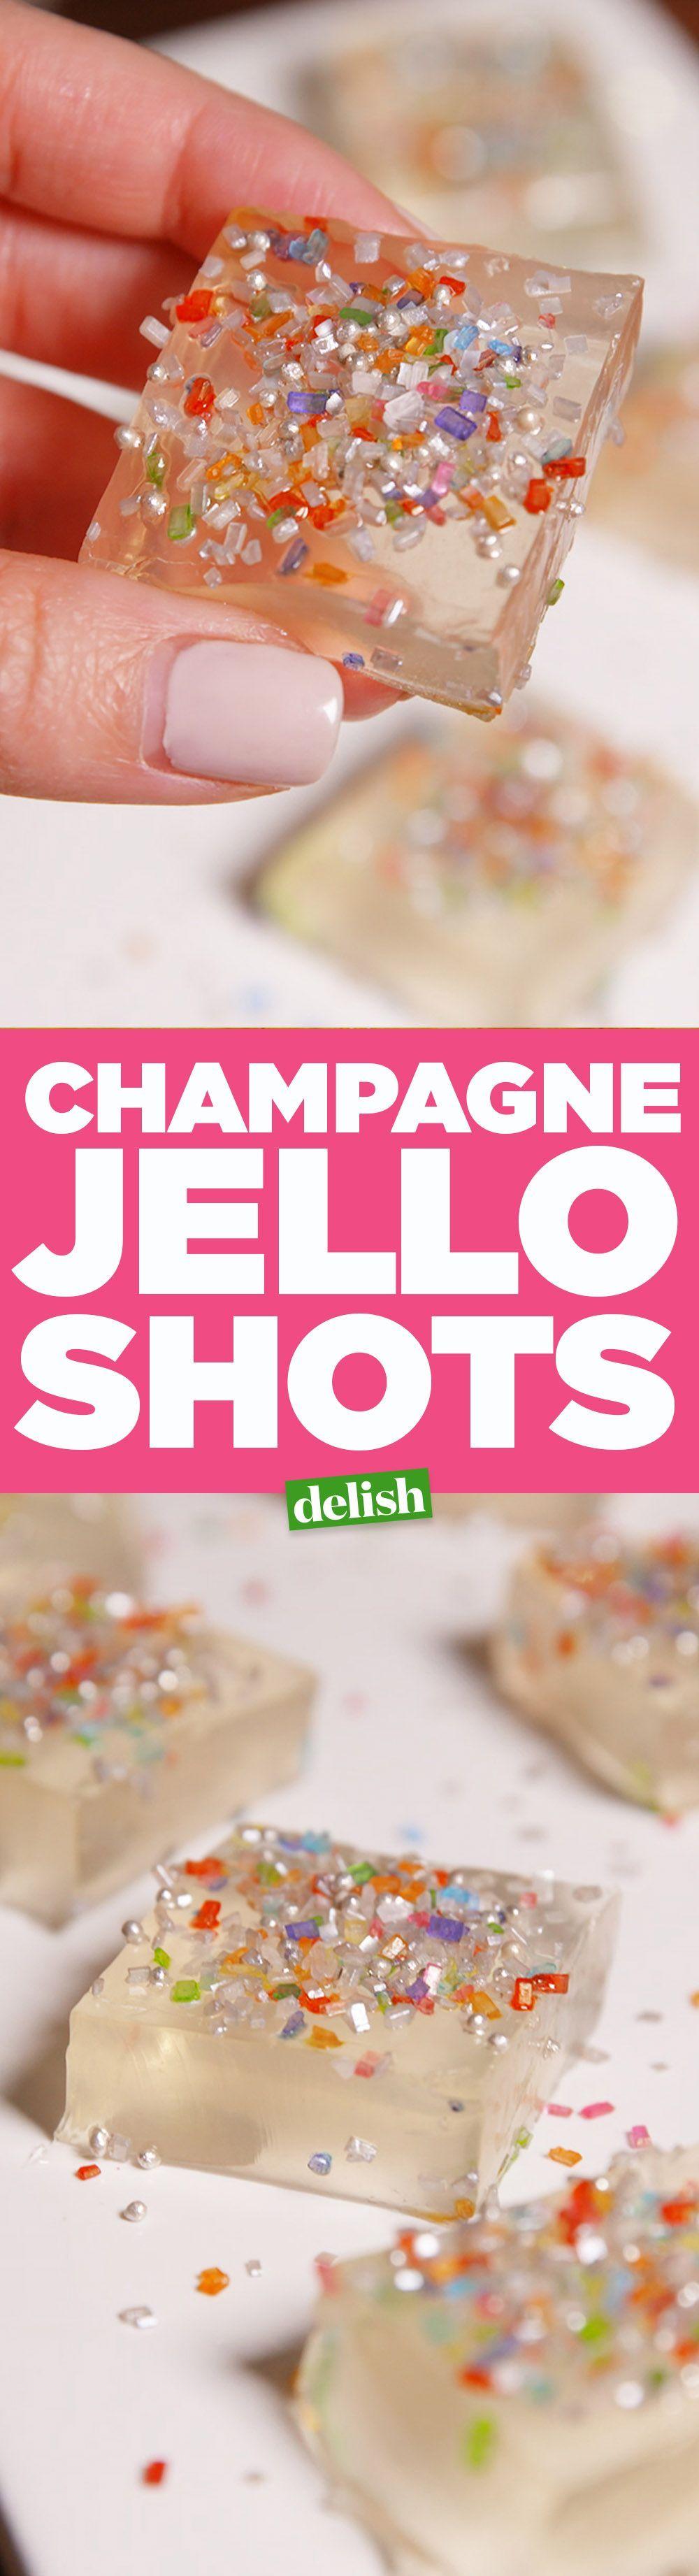 Champagne Jello ShotsDelish